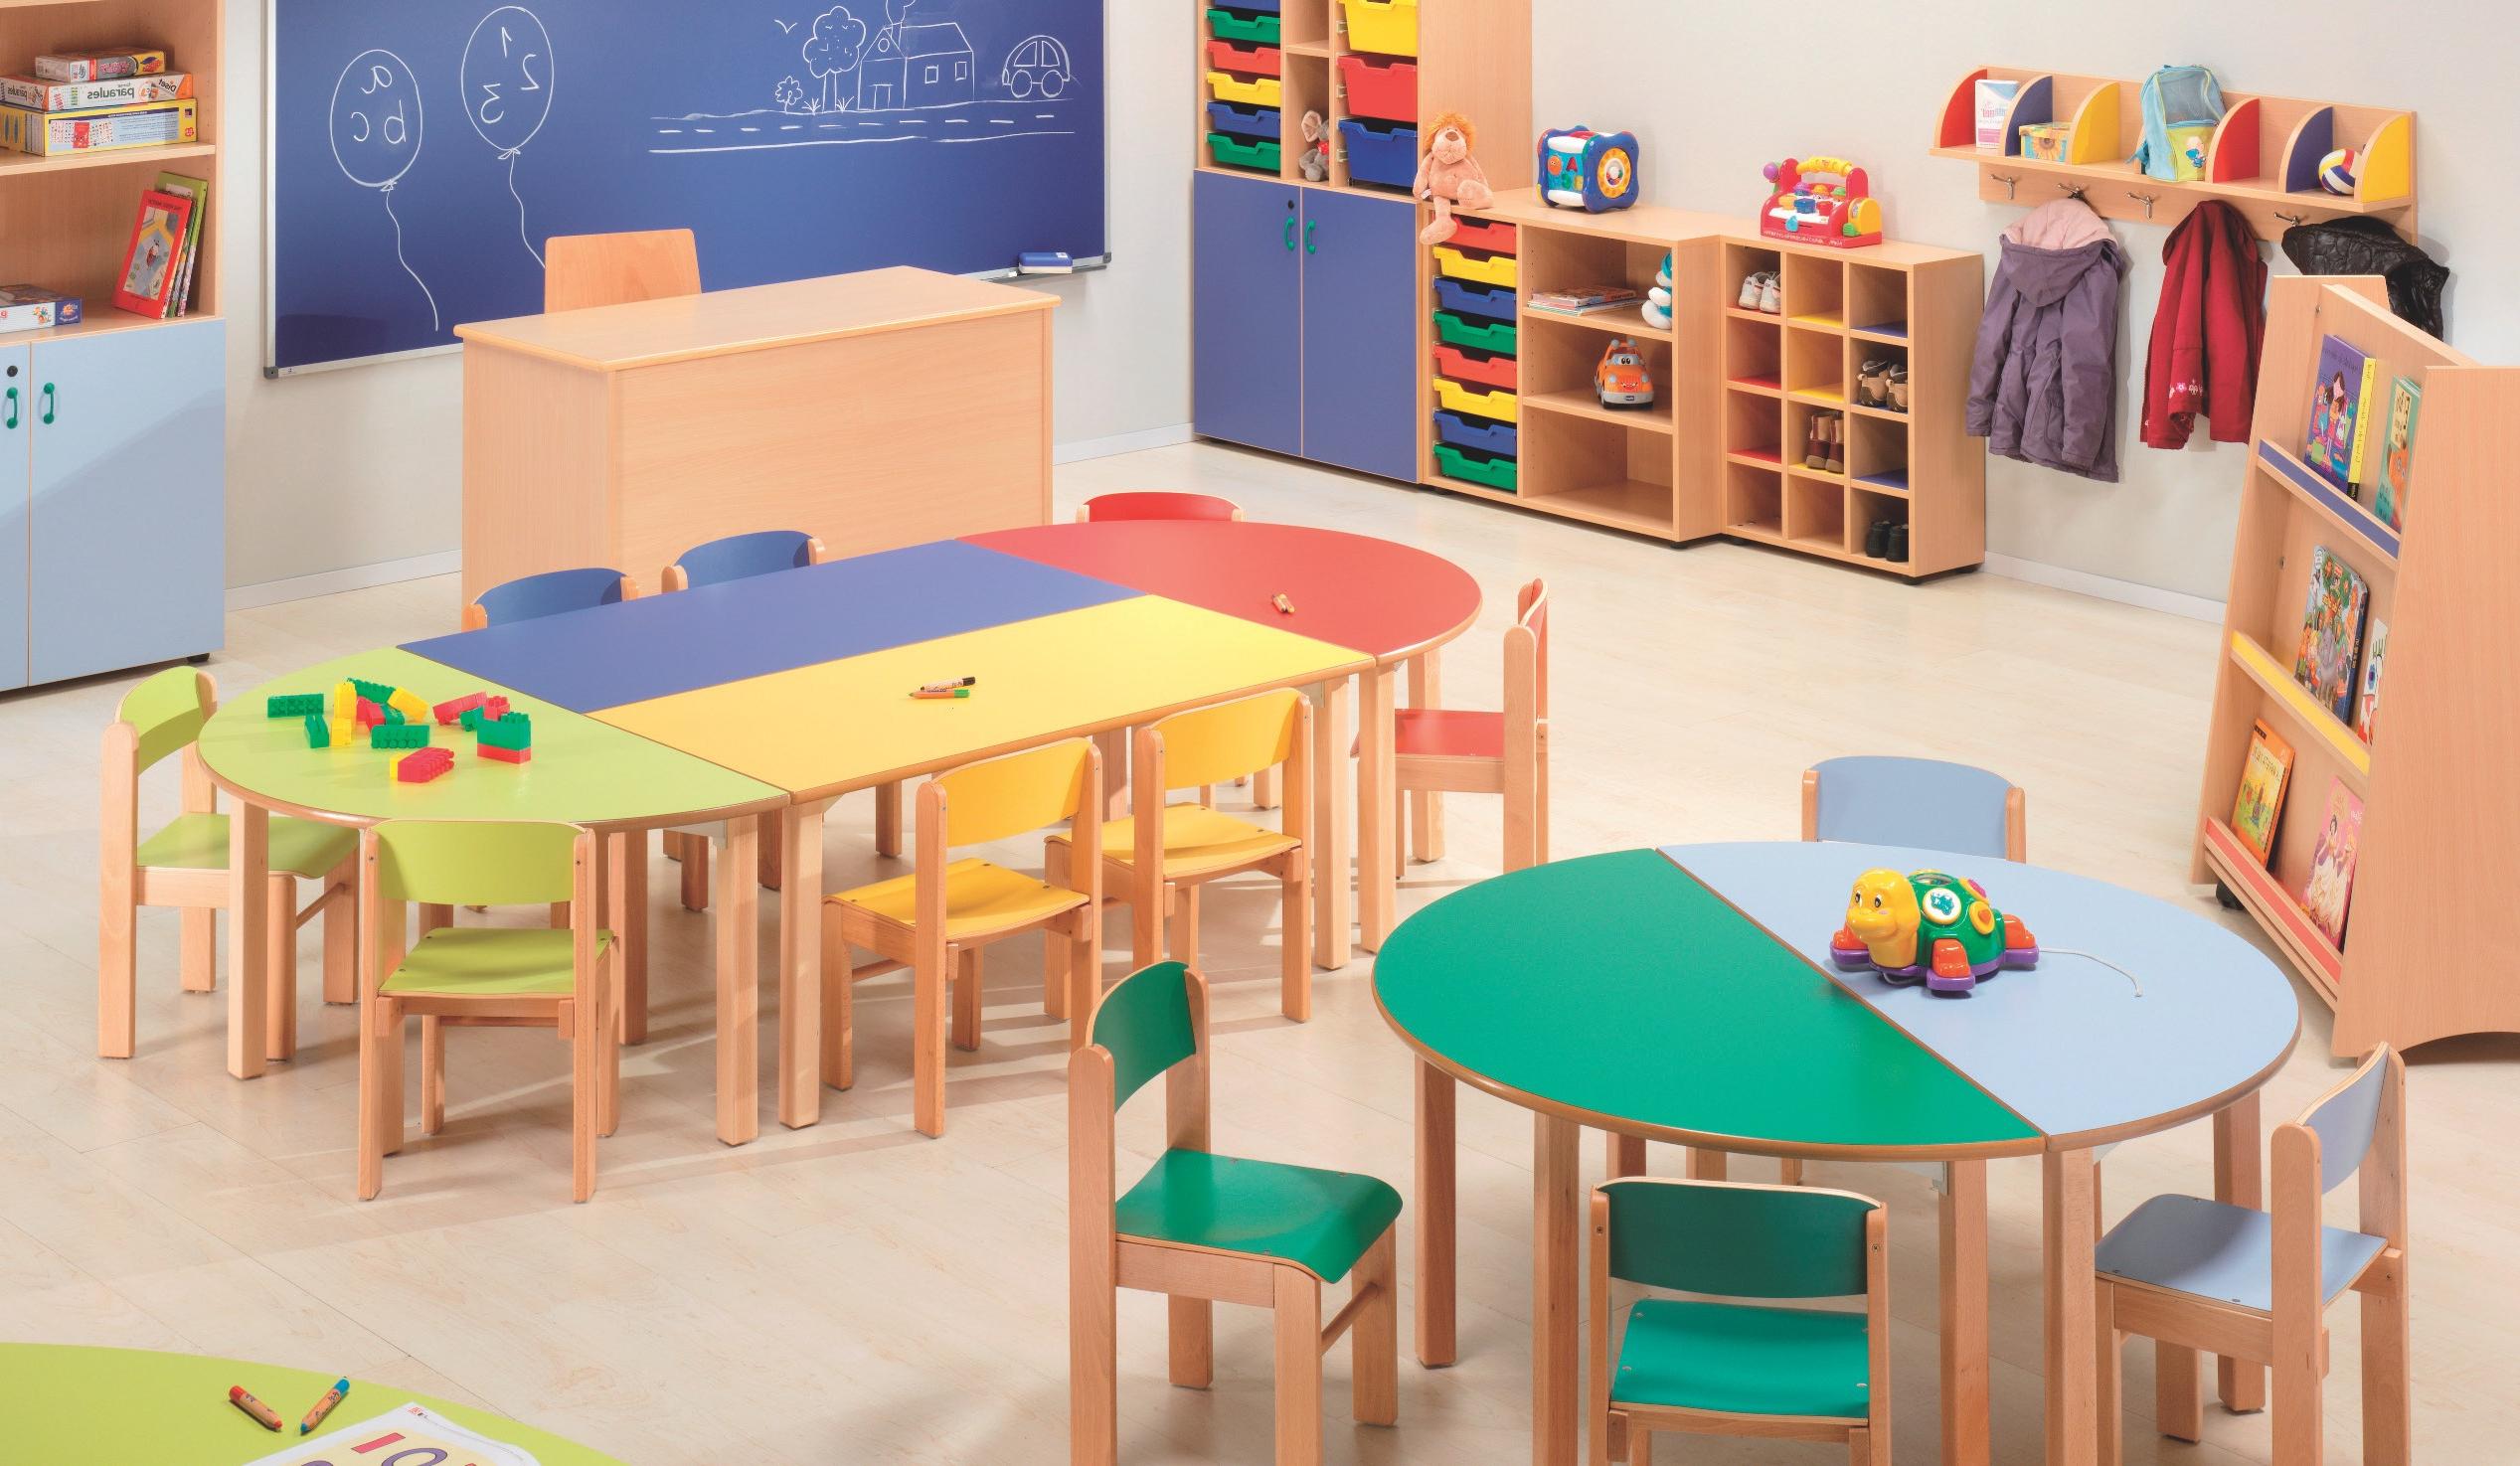 Muebles Infantiles El Corte Ingles Wddj Mobiliario Infantil Oficina Segunda Mano Escolar En Ingles Seating